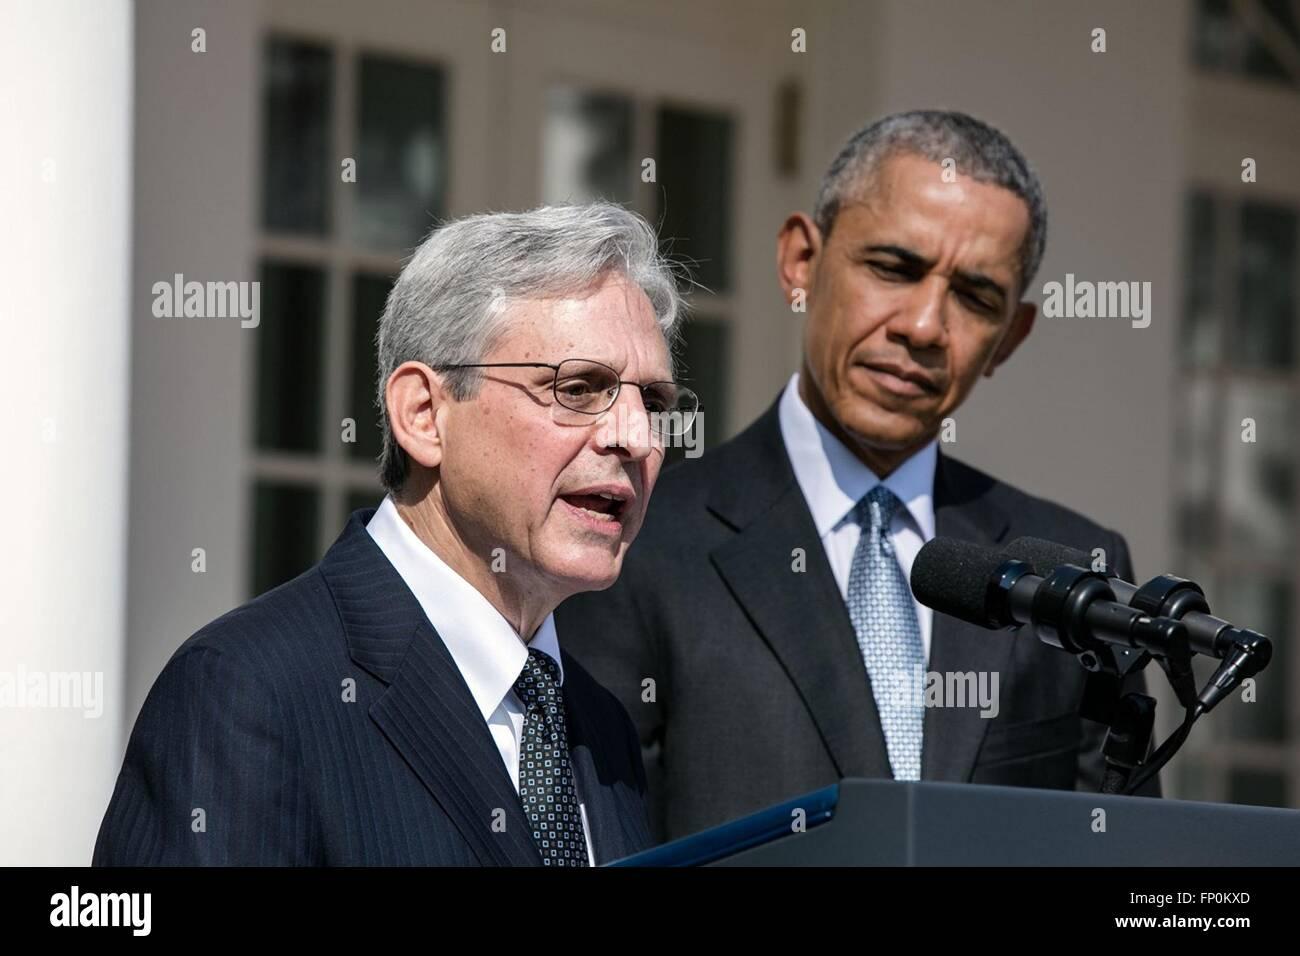 Washington DC, USA. 16th March, 2016. U.S. President Barack Obama listens to Chief Judge Merrick B. Garland make - Stock Image